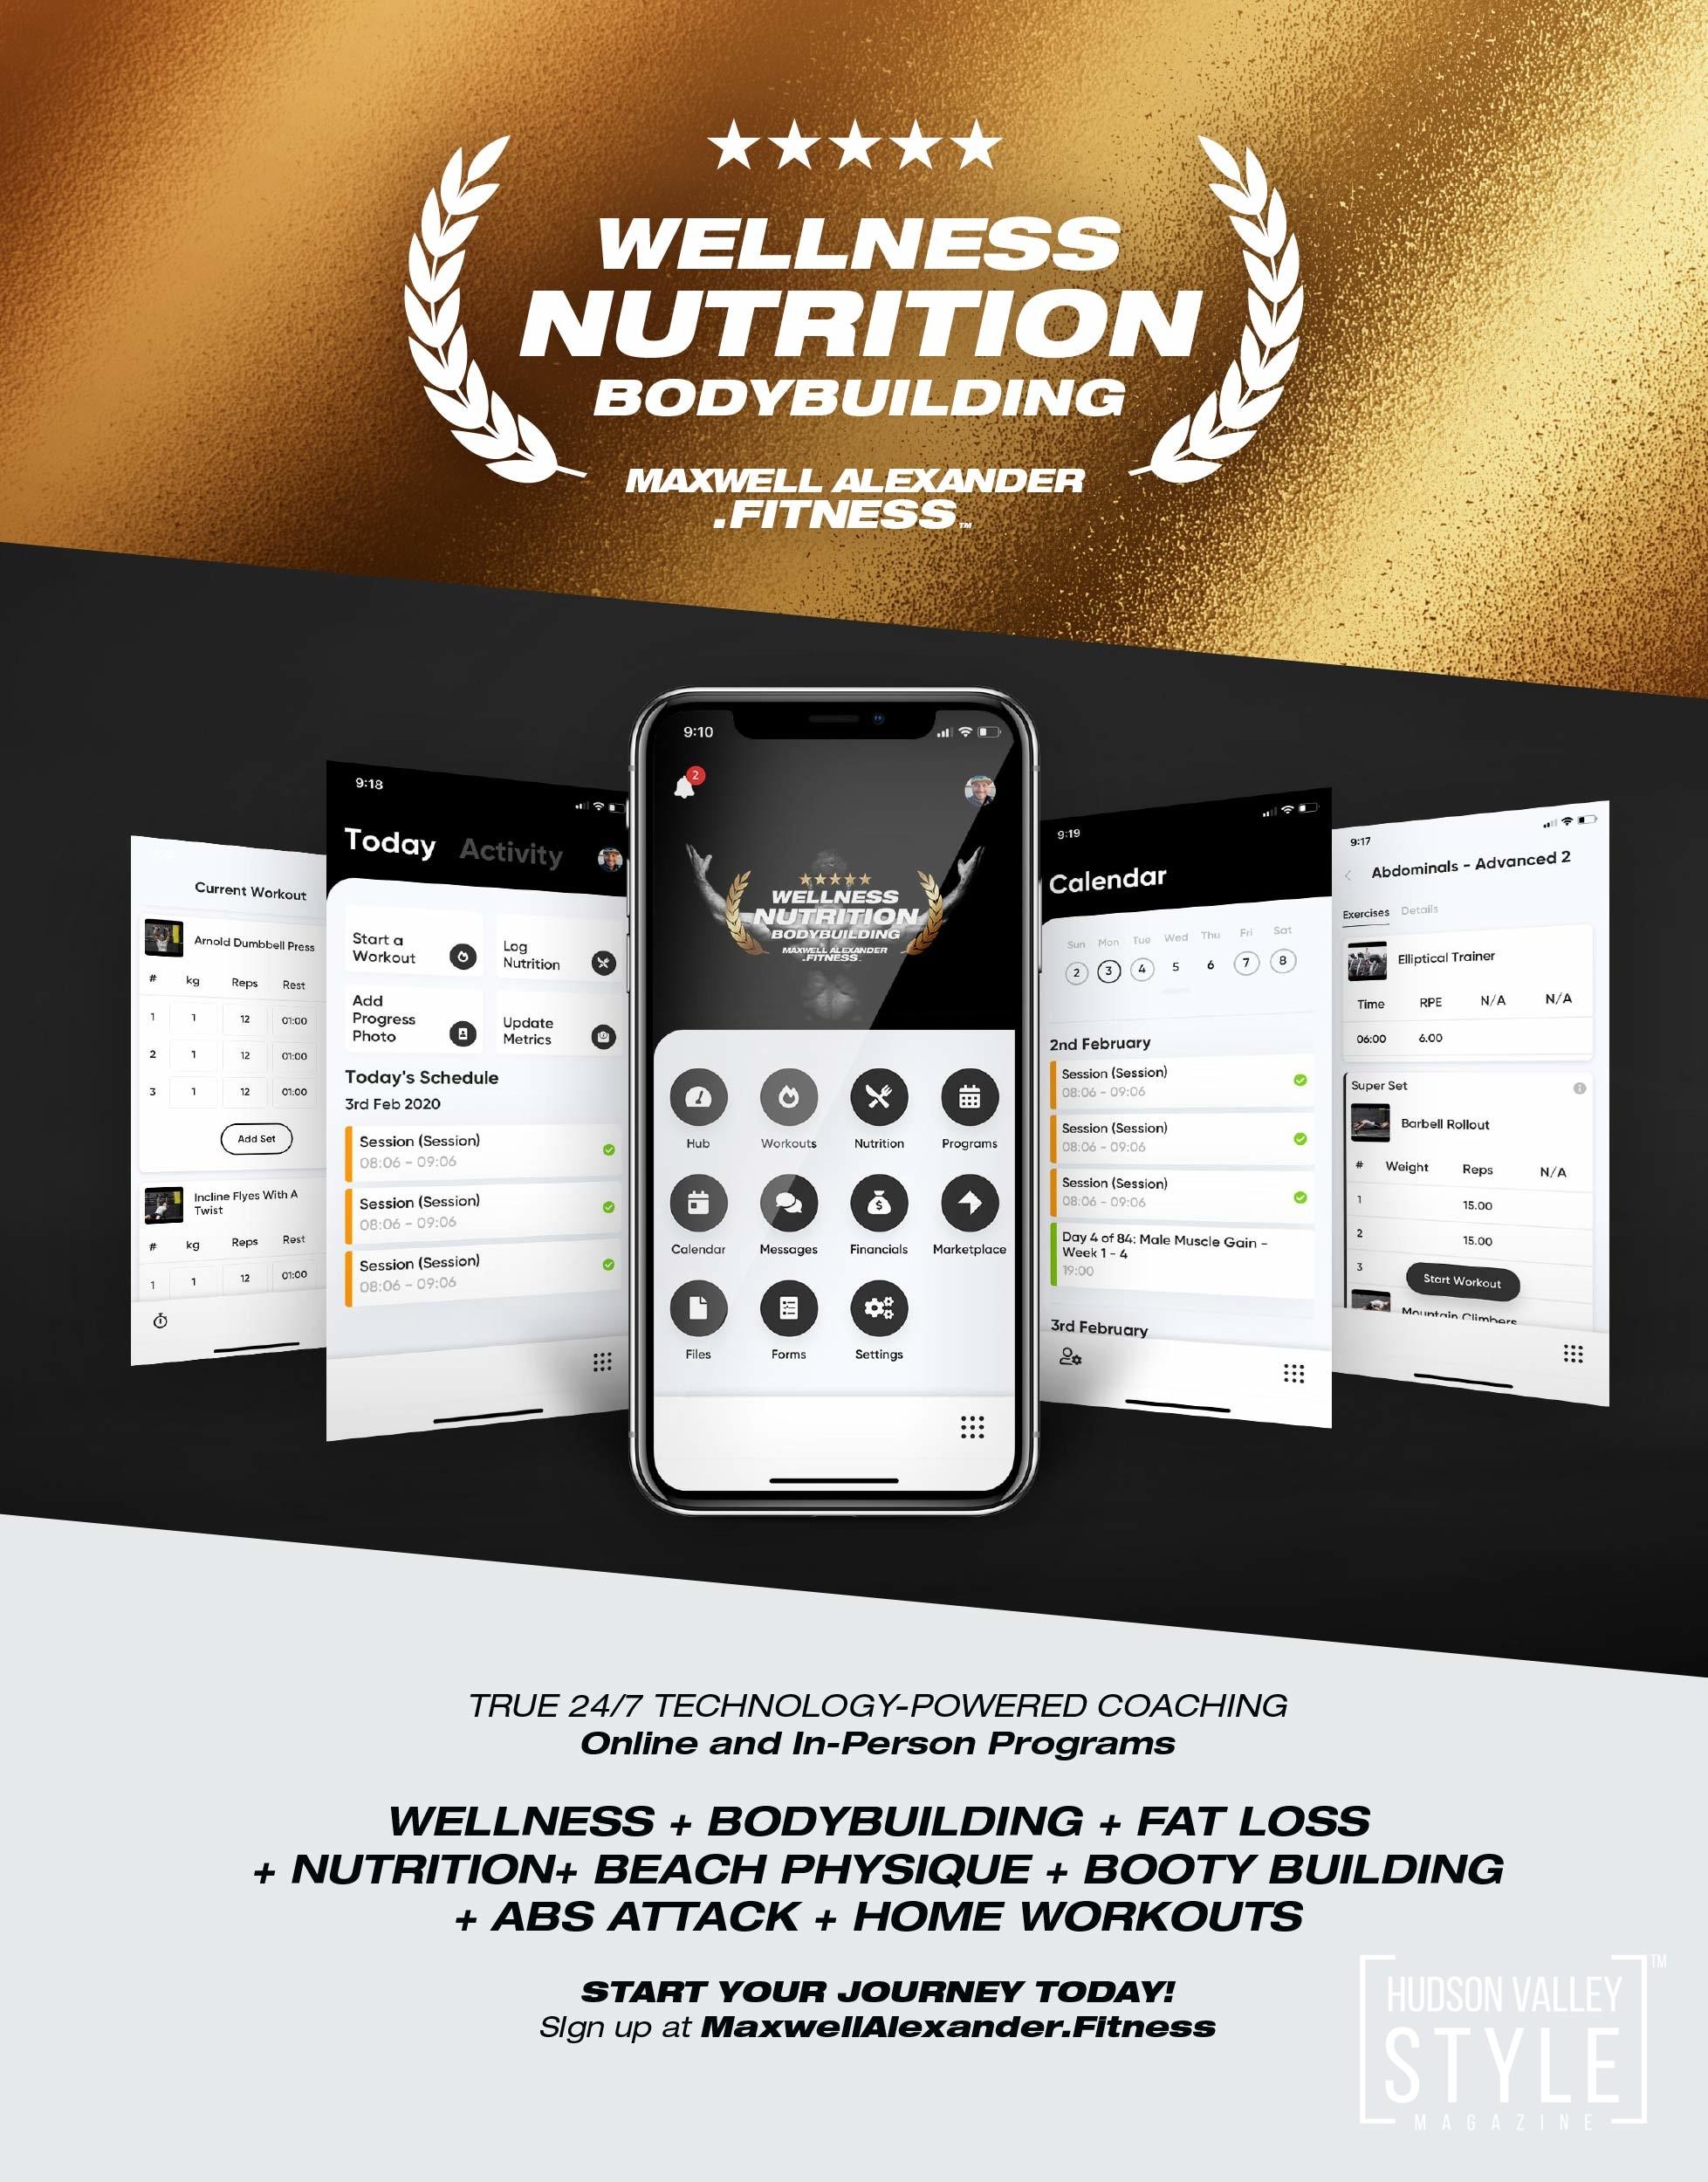 Maxwell Alexander Fitness - Wellness, Nutrition, Bodybuilding - Start your transformation journey today!